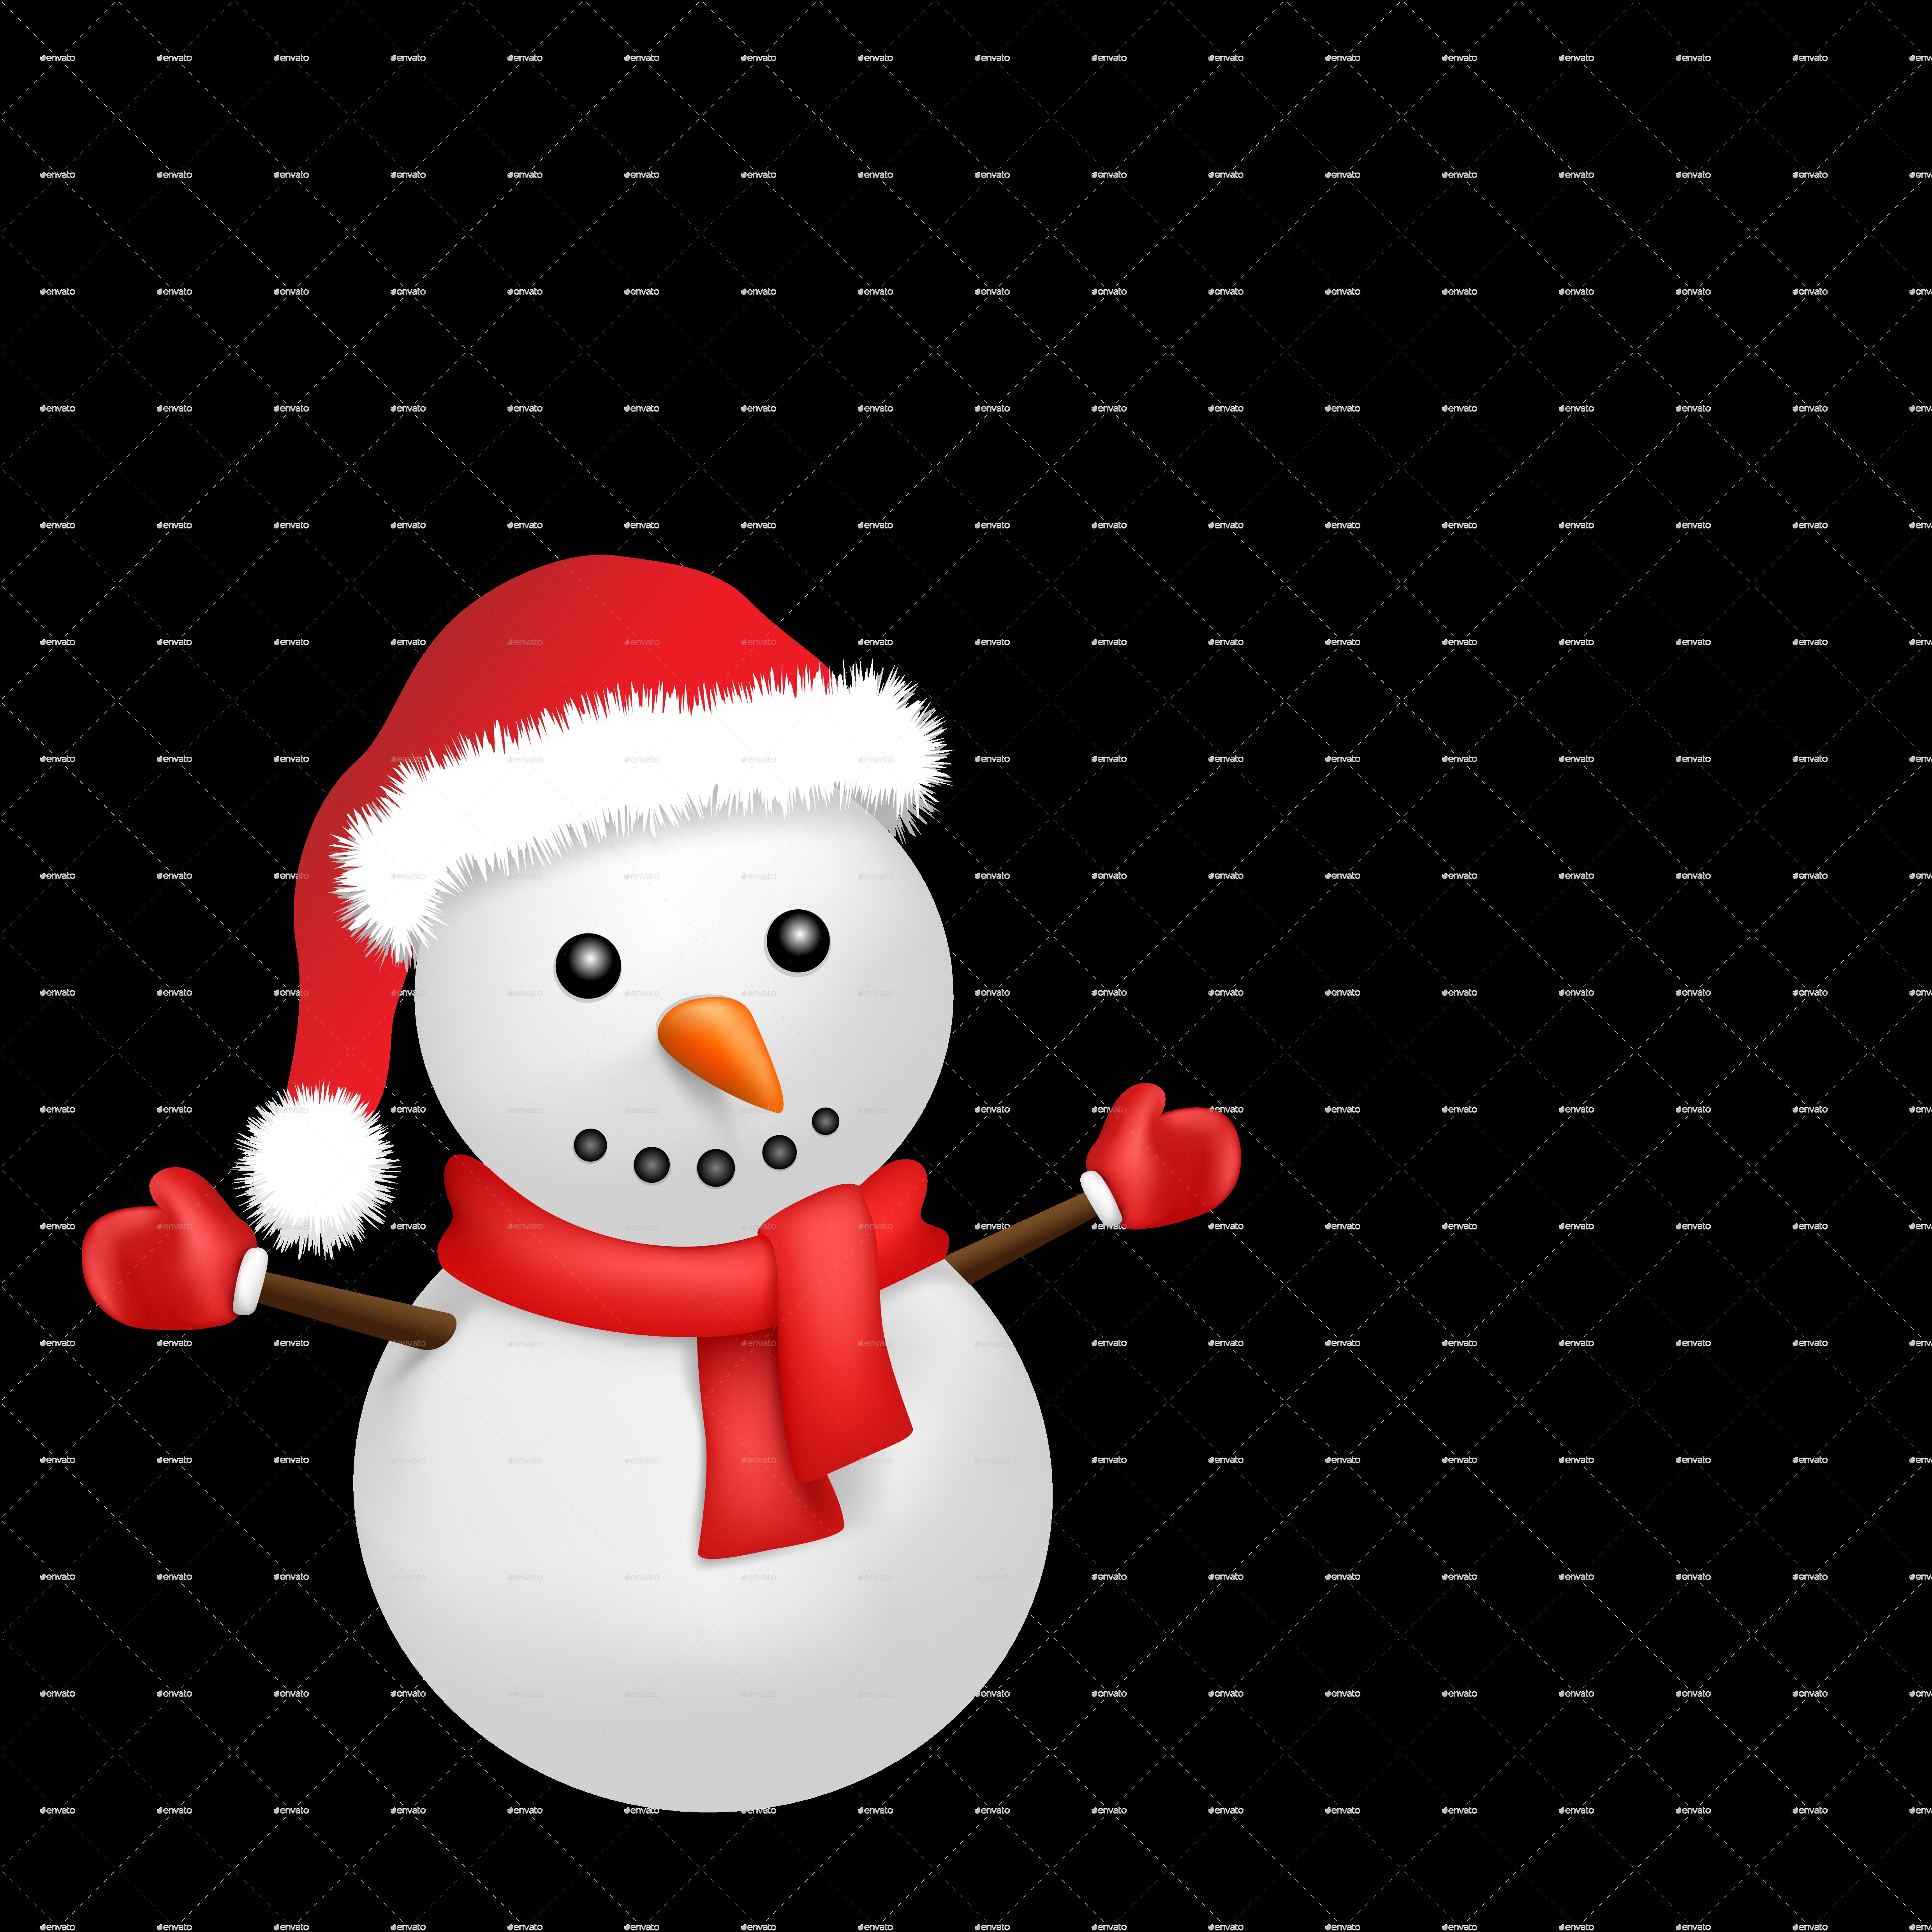 Download Snowman Png Picture Hq Png Image Freepngimg Snowman Png Png Images